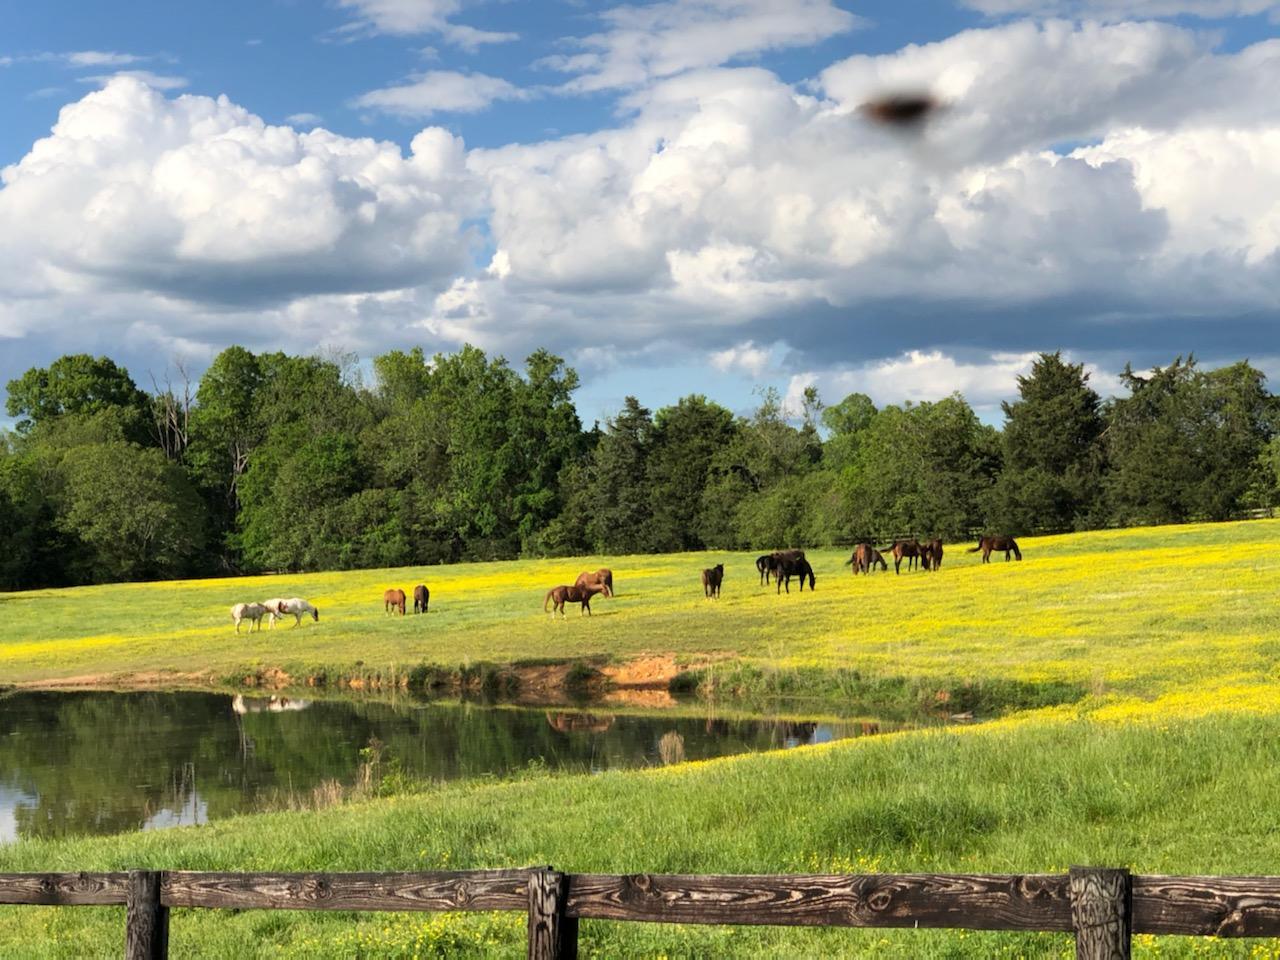 Chapel Hill, North Carolina (United States)